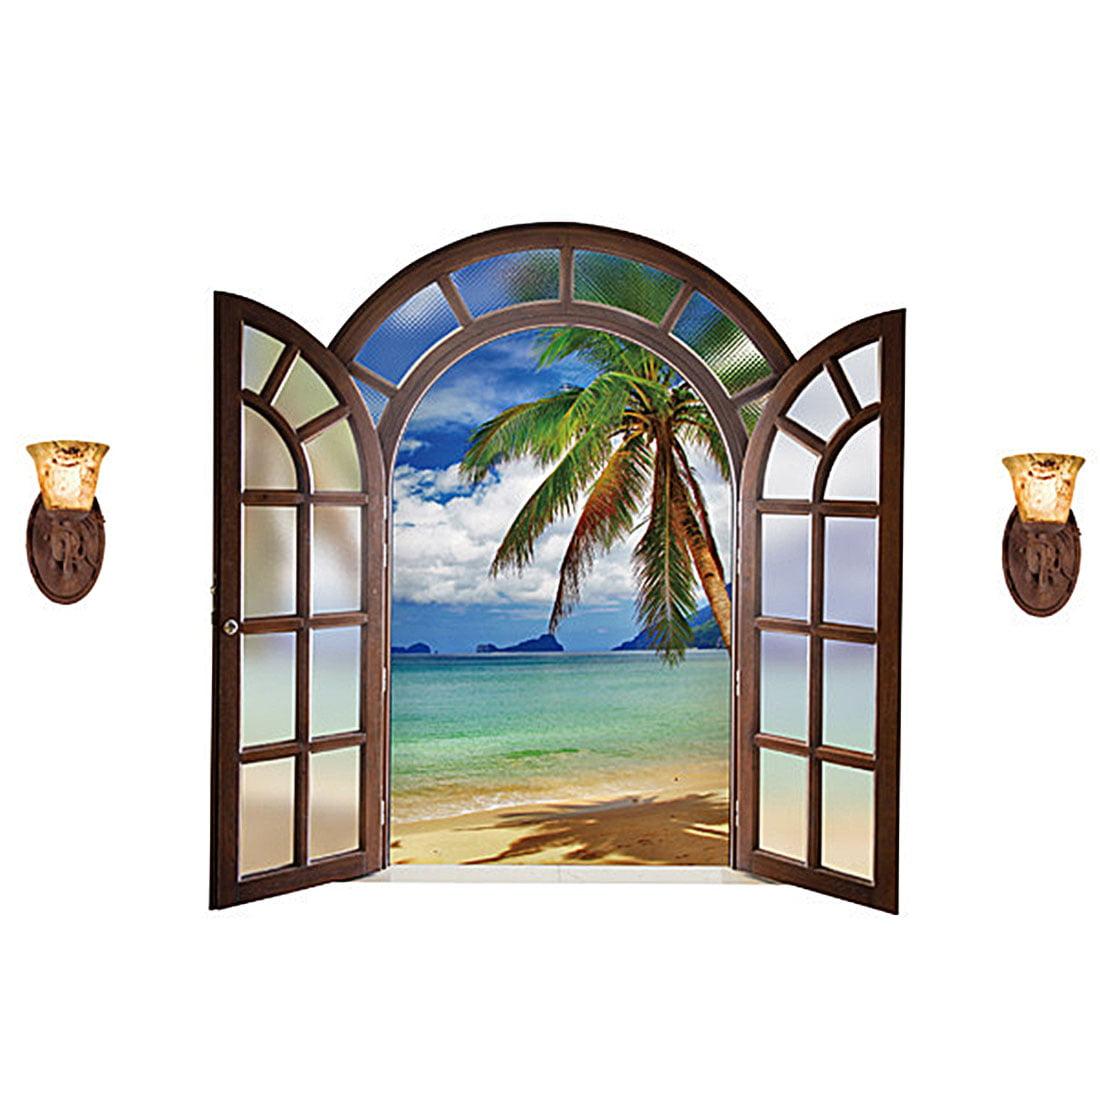 Unique Bargains Office PVC Seascape Print Window Film Protector Wall Decal Sticker Wallpaper